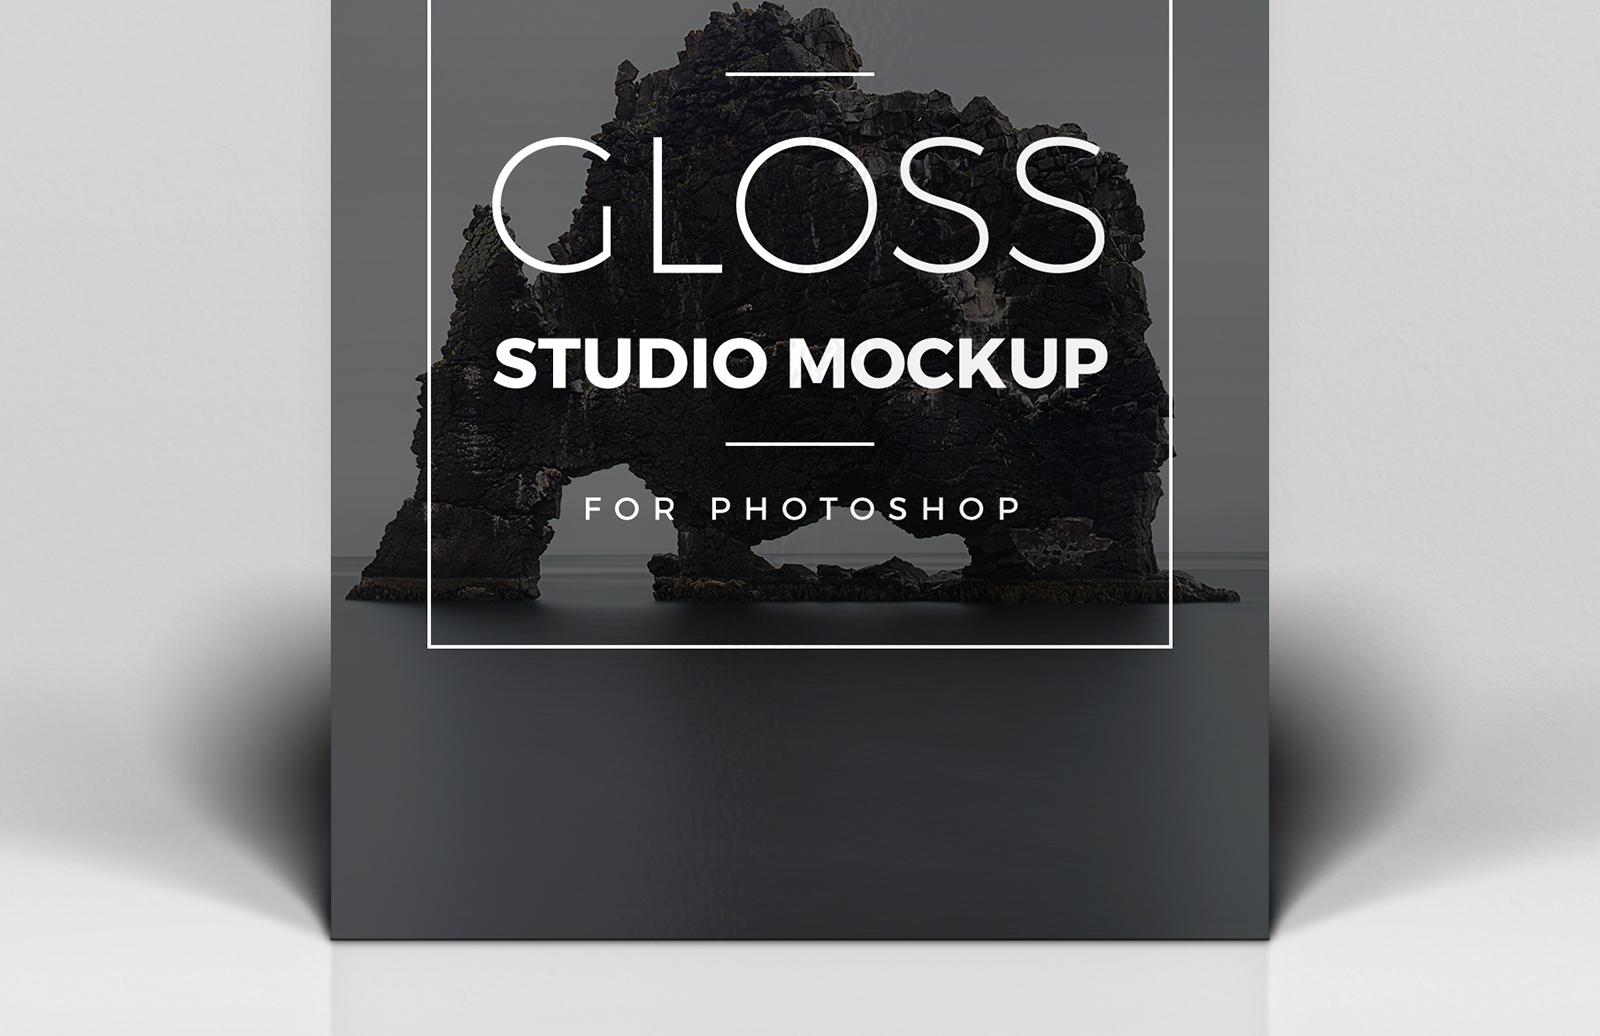 Gloss Studio Mockup